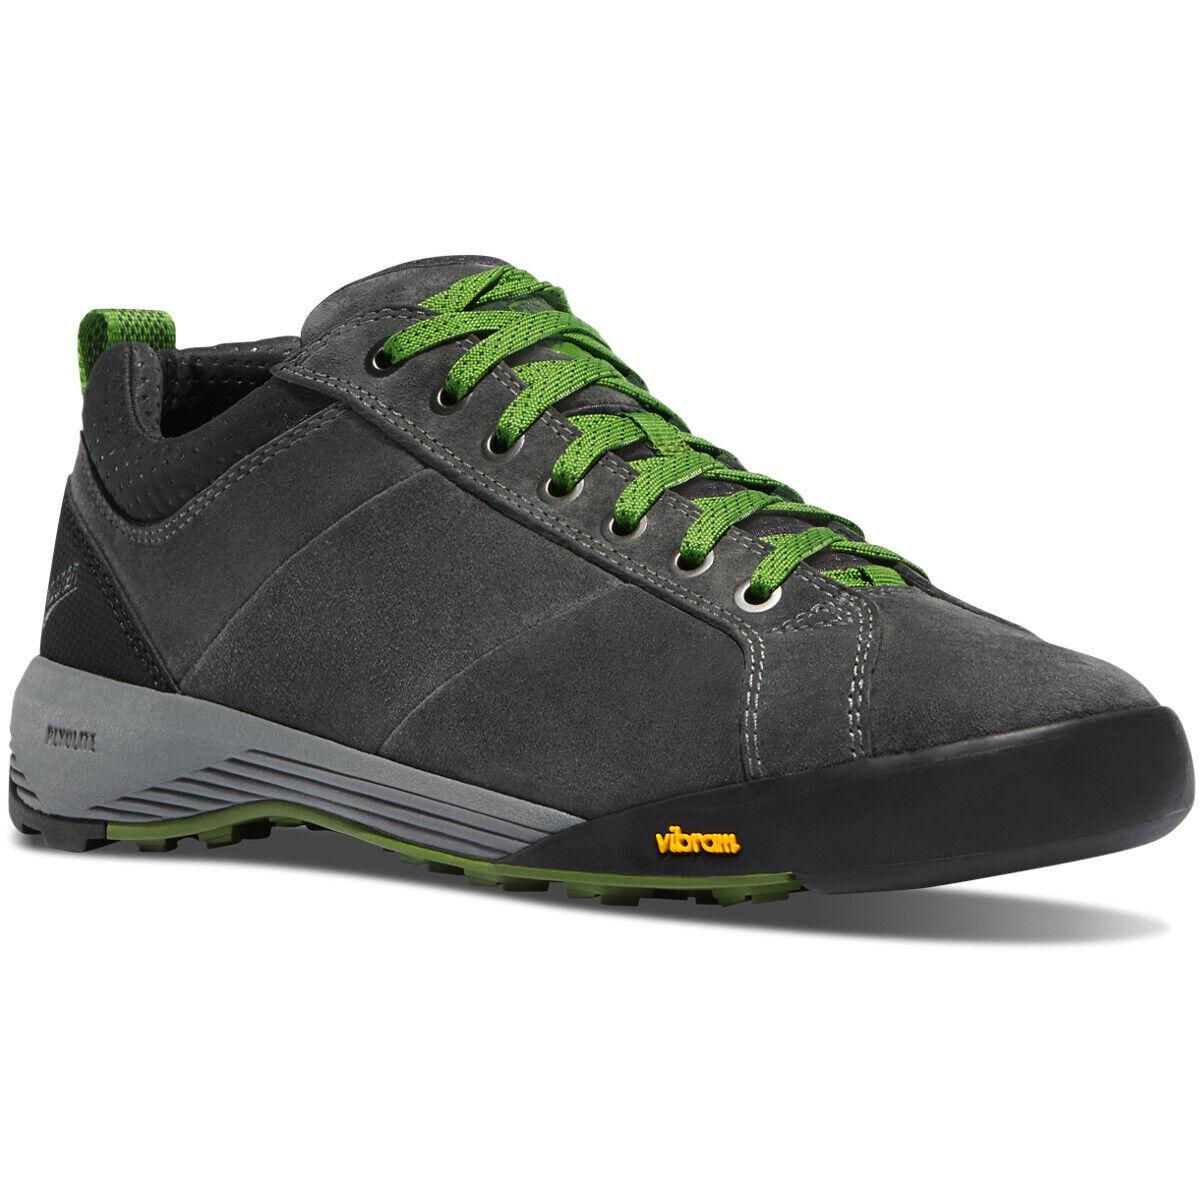 Danner Para Hombre Trail Hiking Camp Sherman ligero tamaño del zapato 11 D gris verde